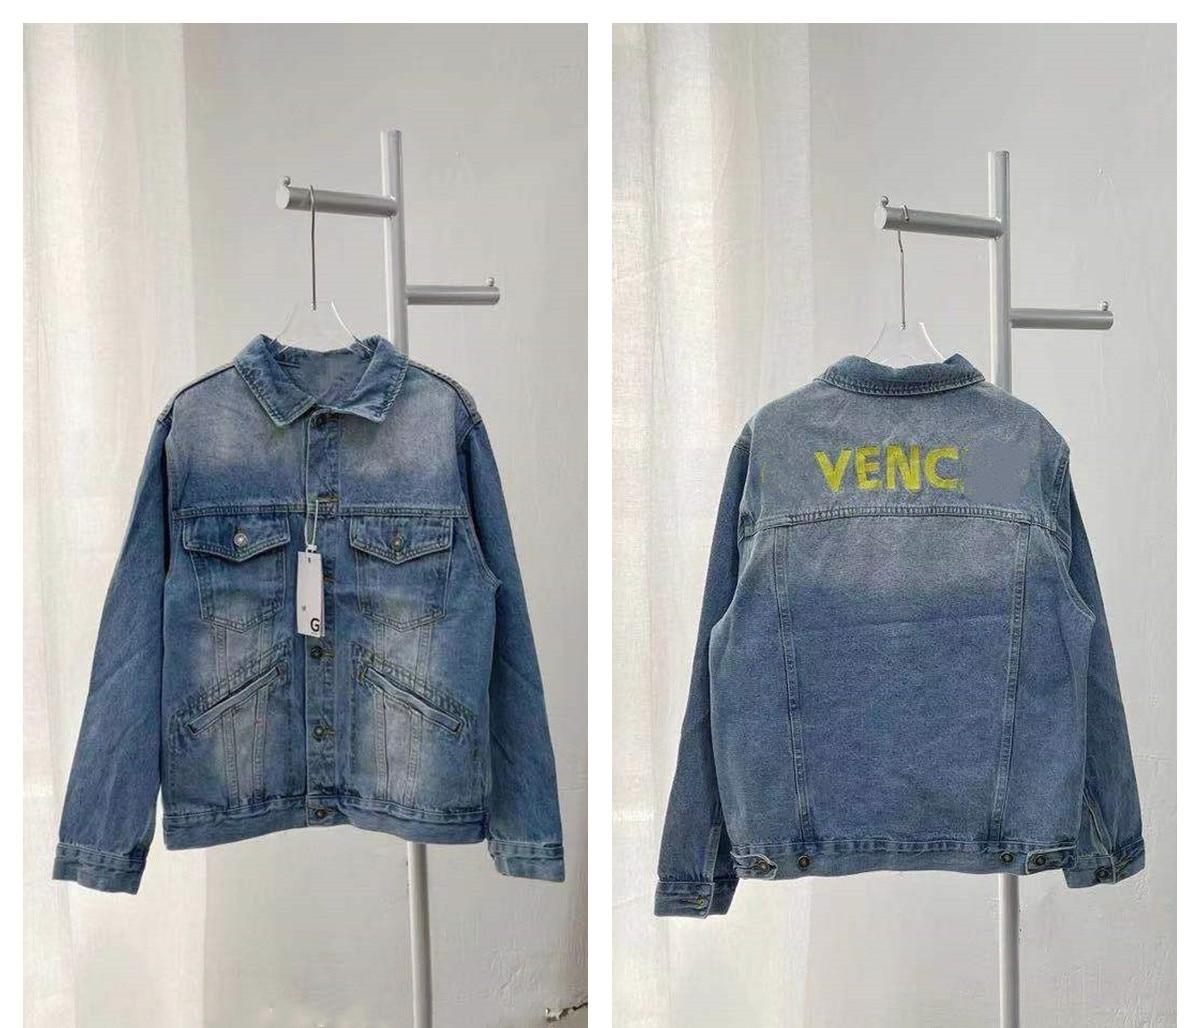 2021 Paris Spring and summer Fashion Hip Hop Denim Jacket Male Cowboy Ripped Hole European Size S~XL 154